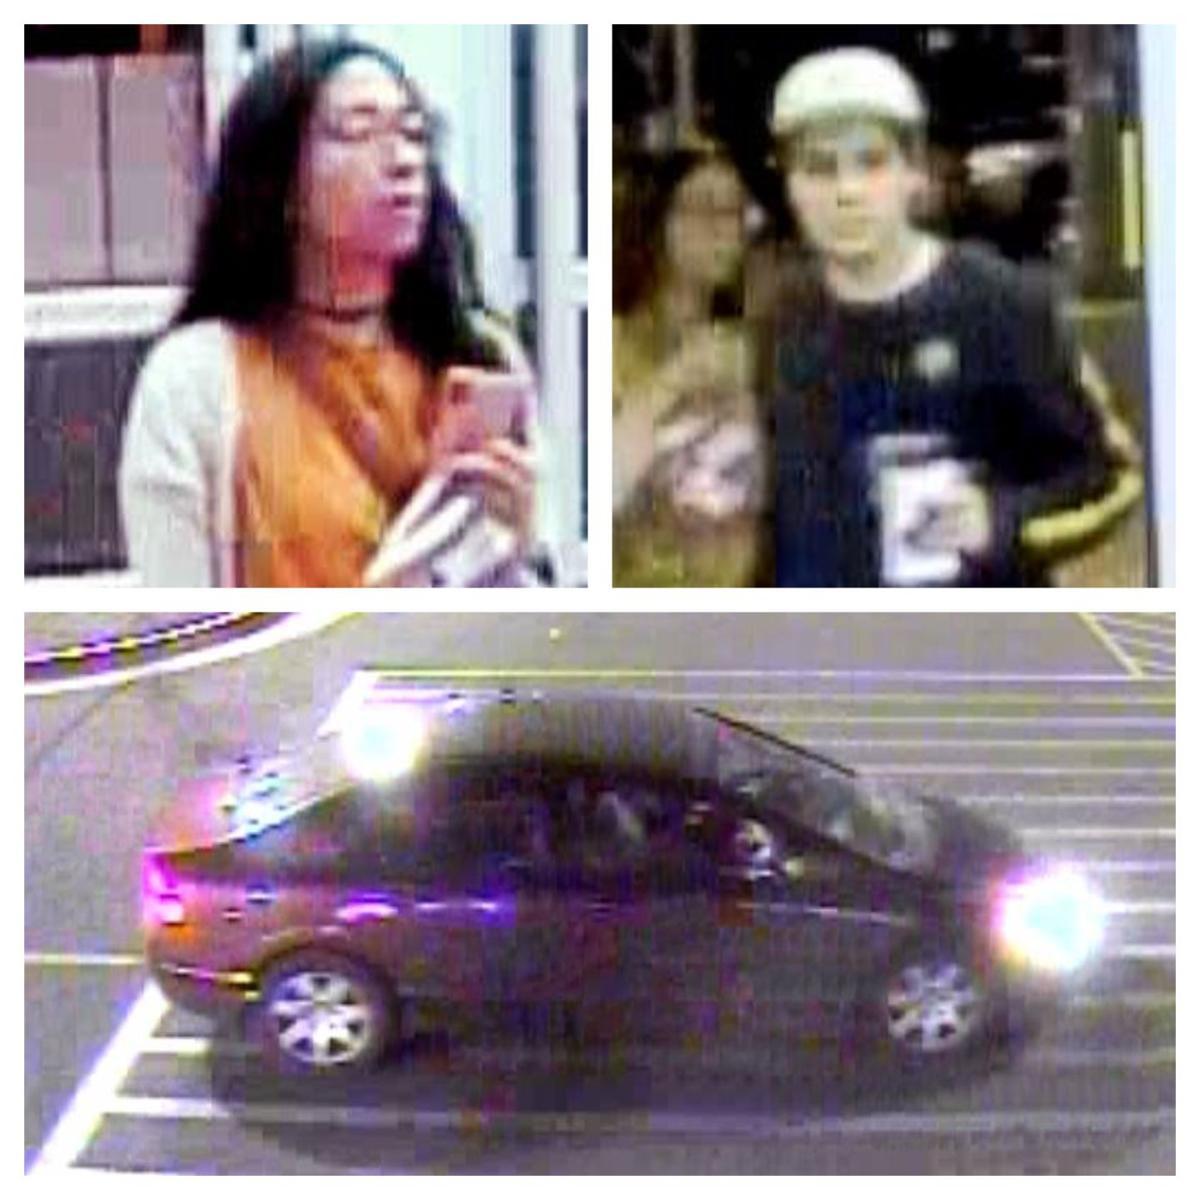 Walmart robbery suspects